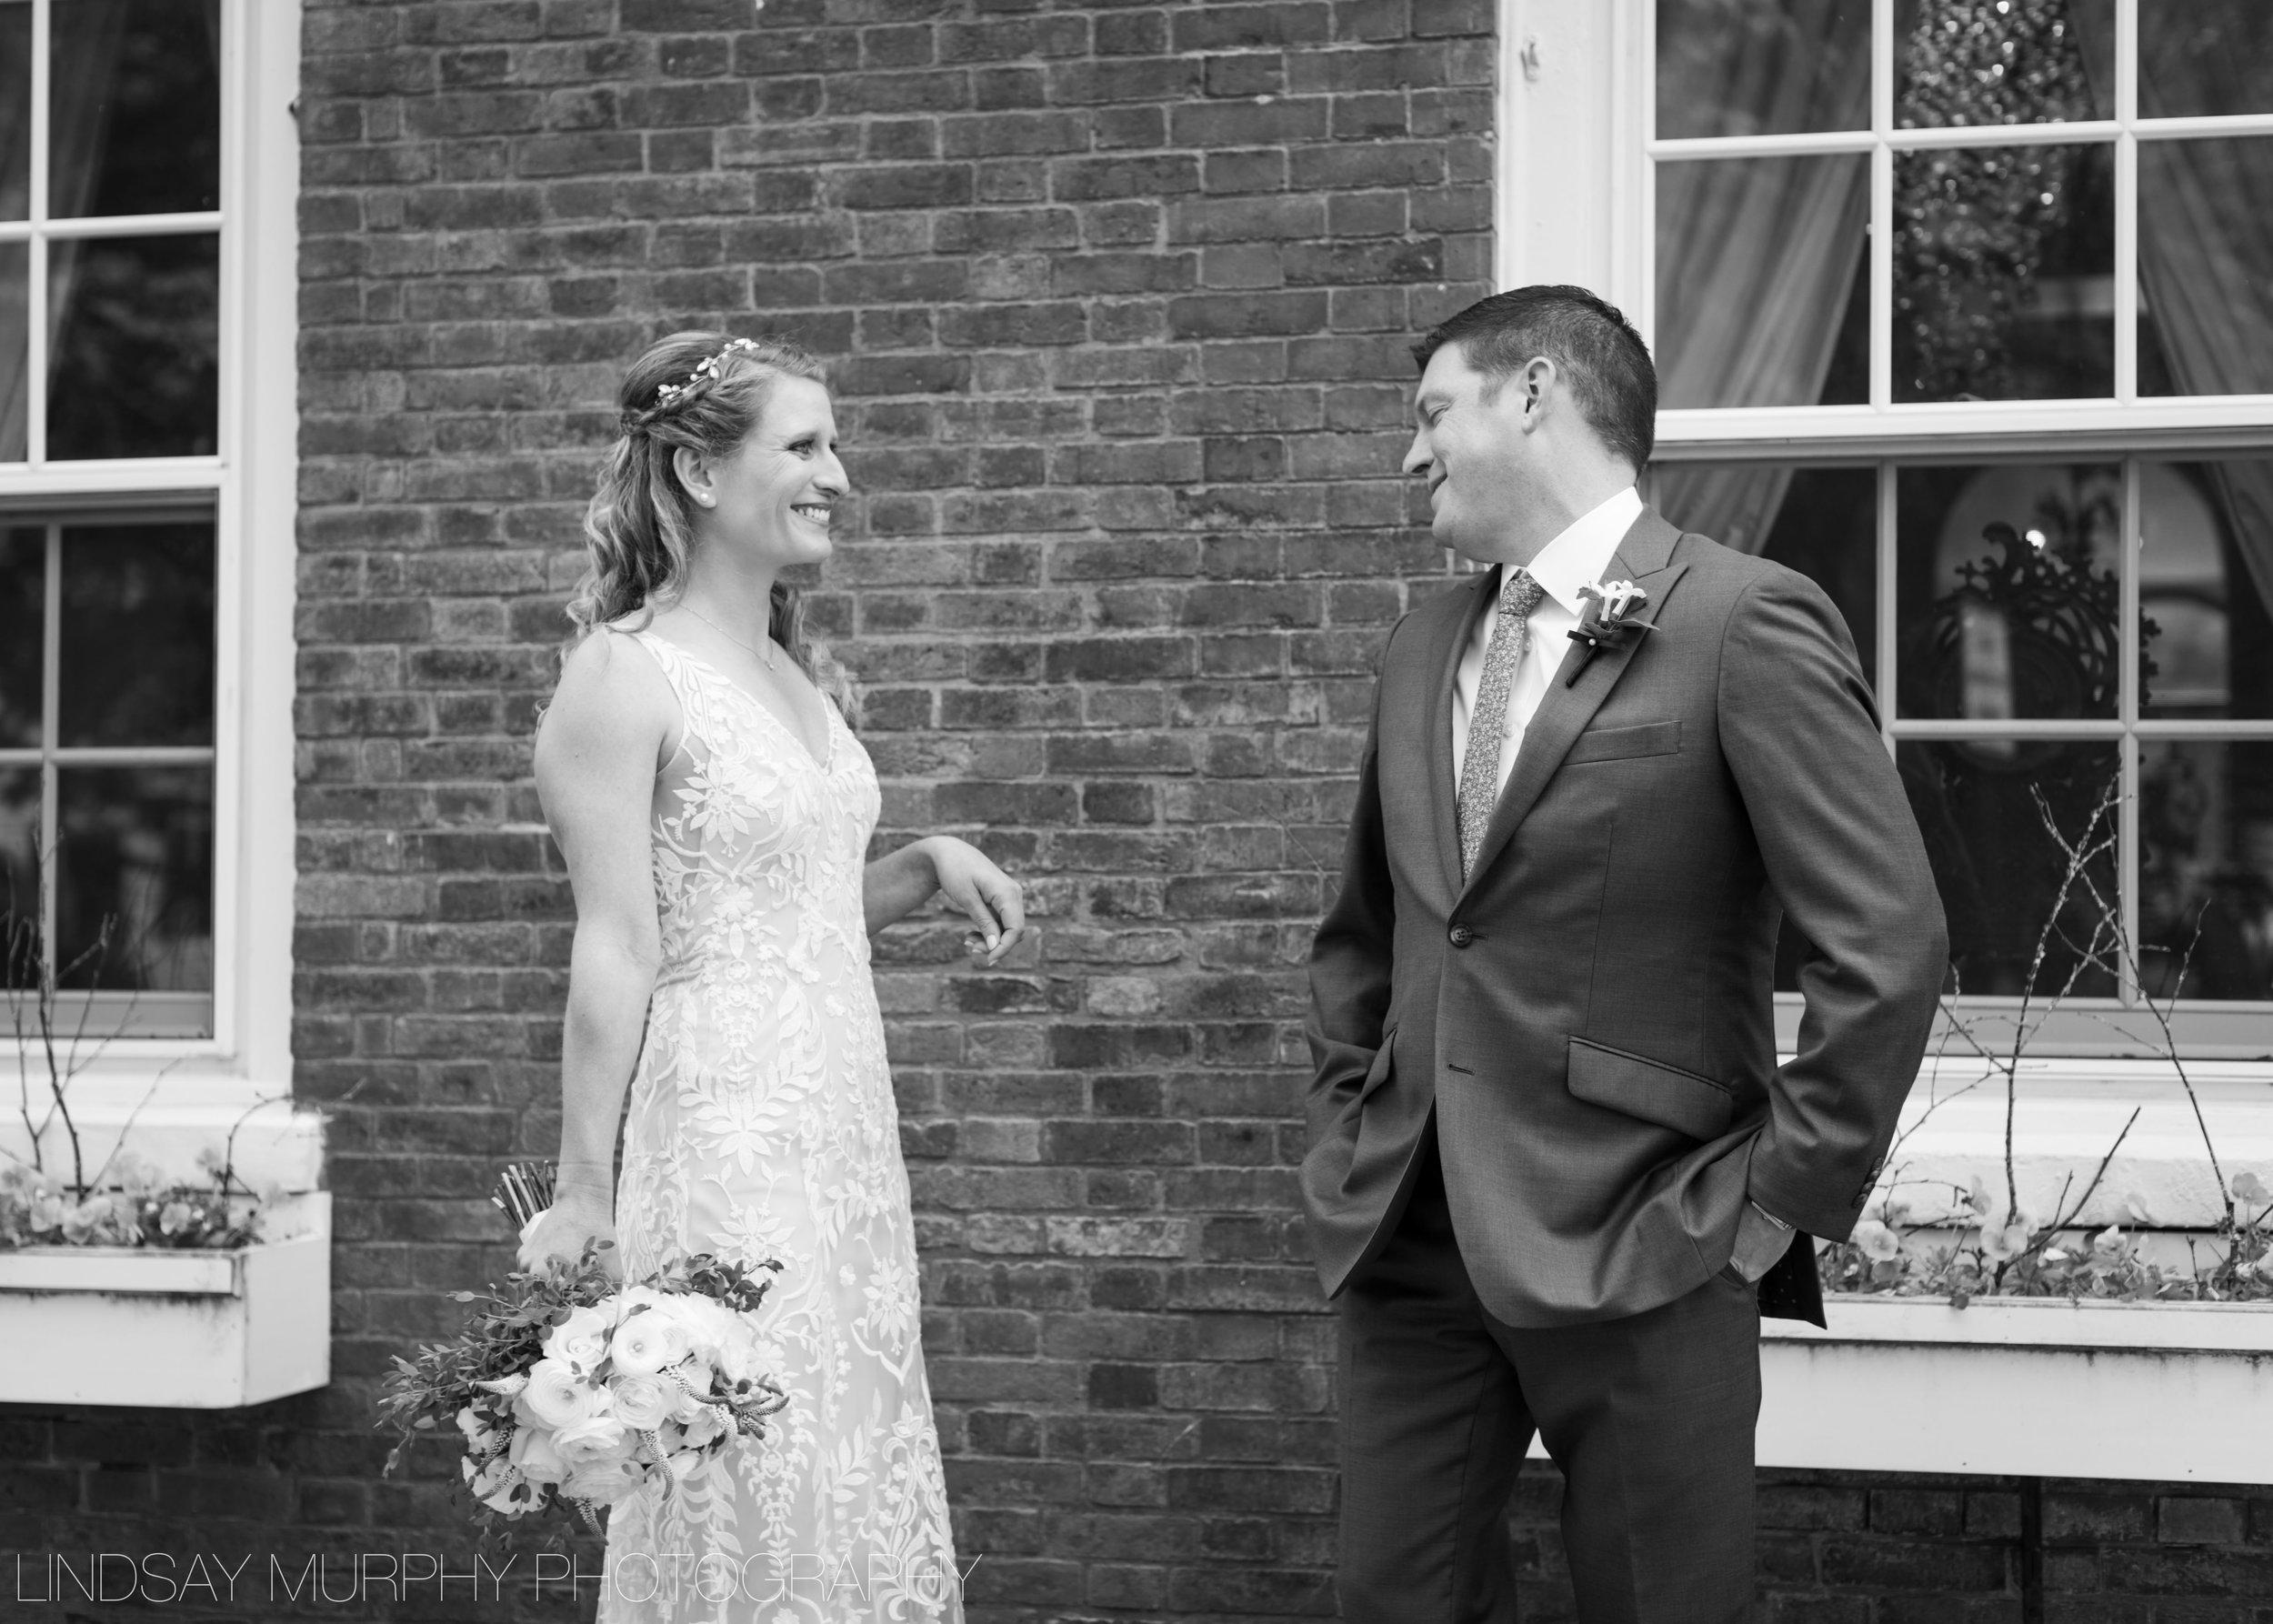 Ipswich_Wedding-509.jpg